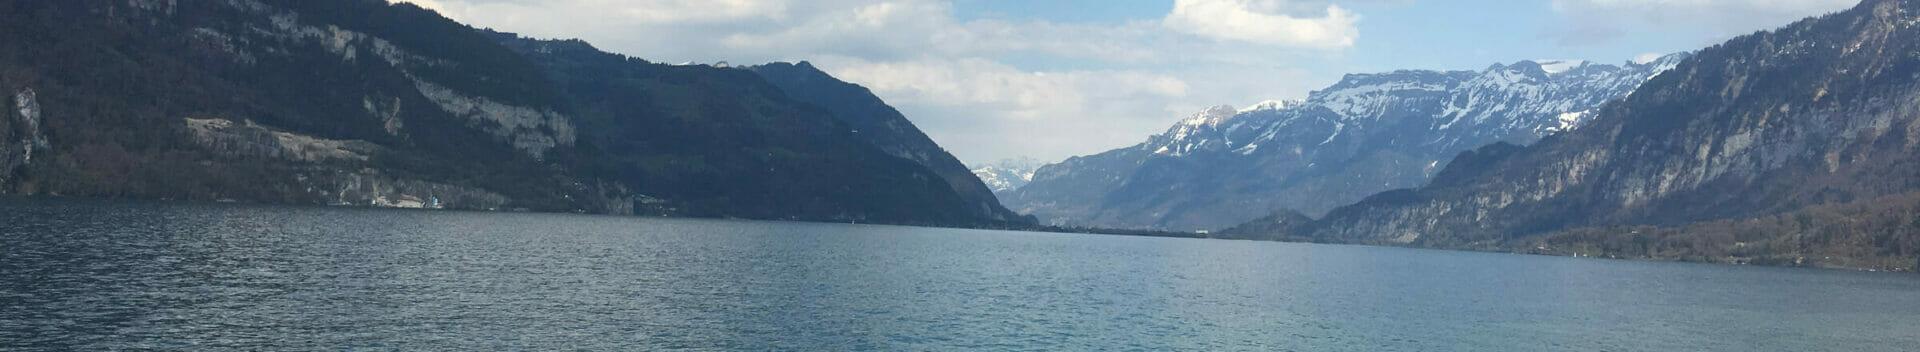 Thuner See am Aareradweg - Schweiz